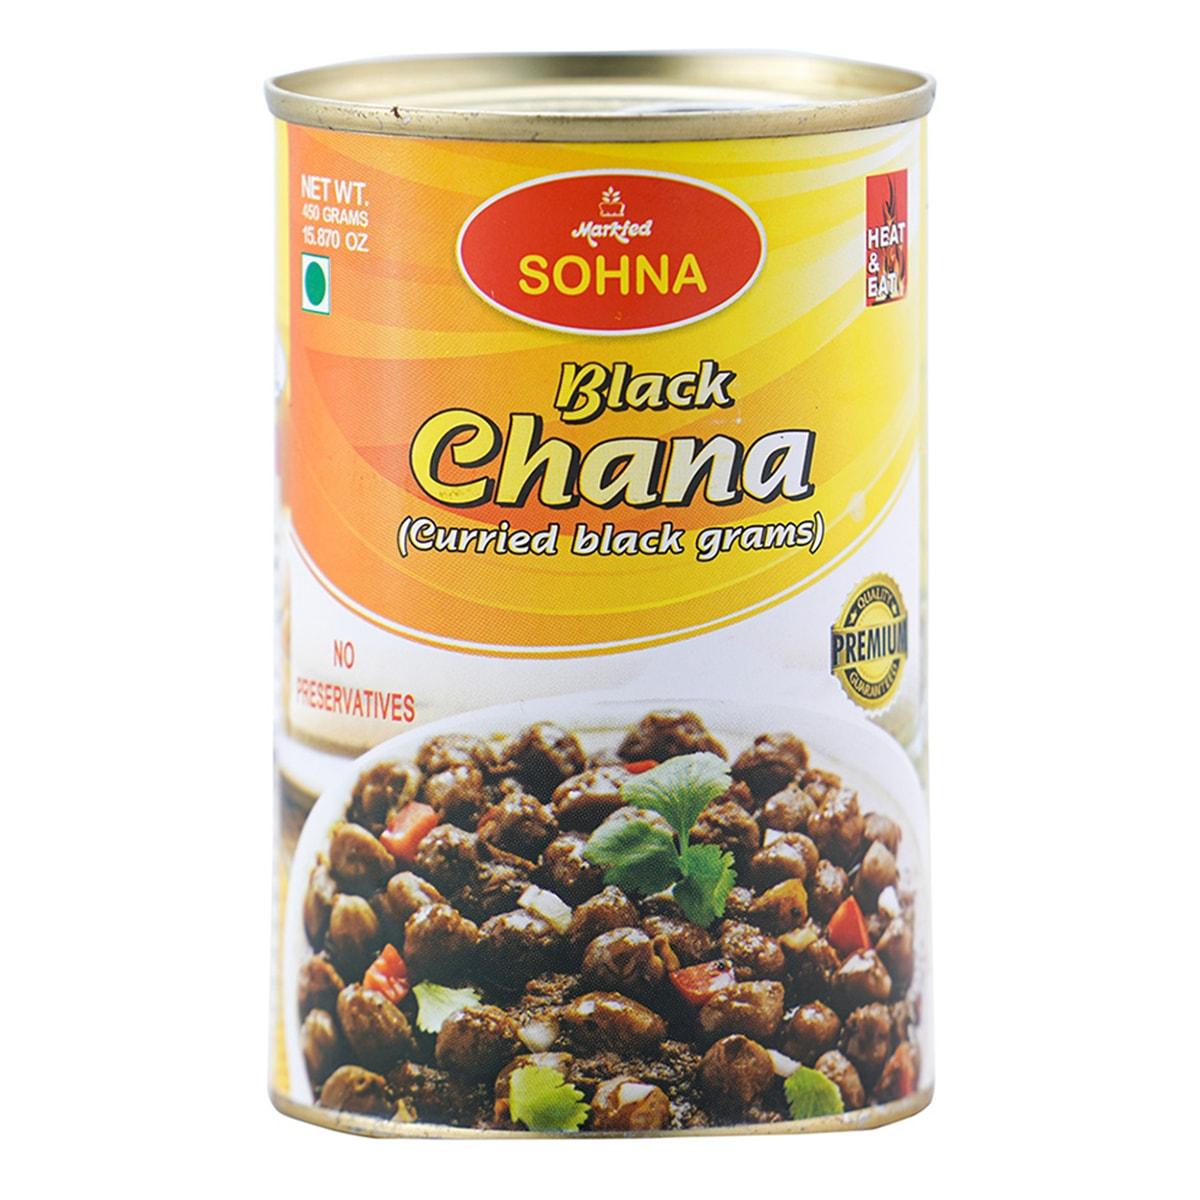 Buy Markfed Sohna Kala Chana (Black Grams Curried) - 450 gm